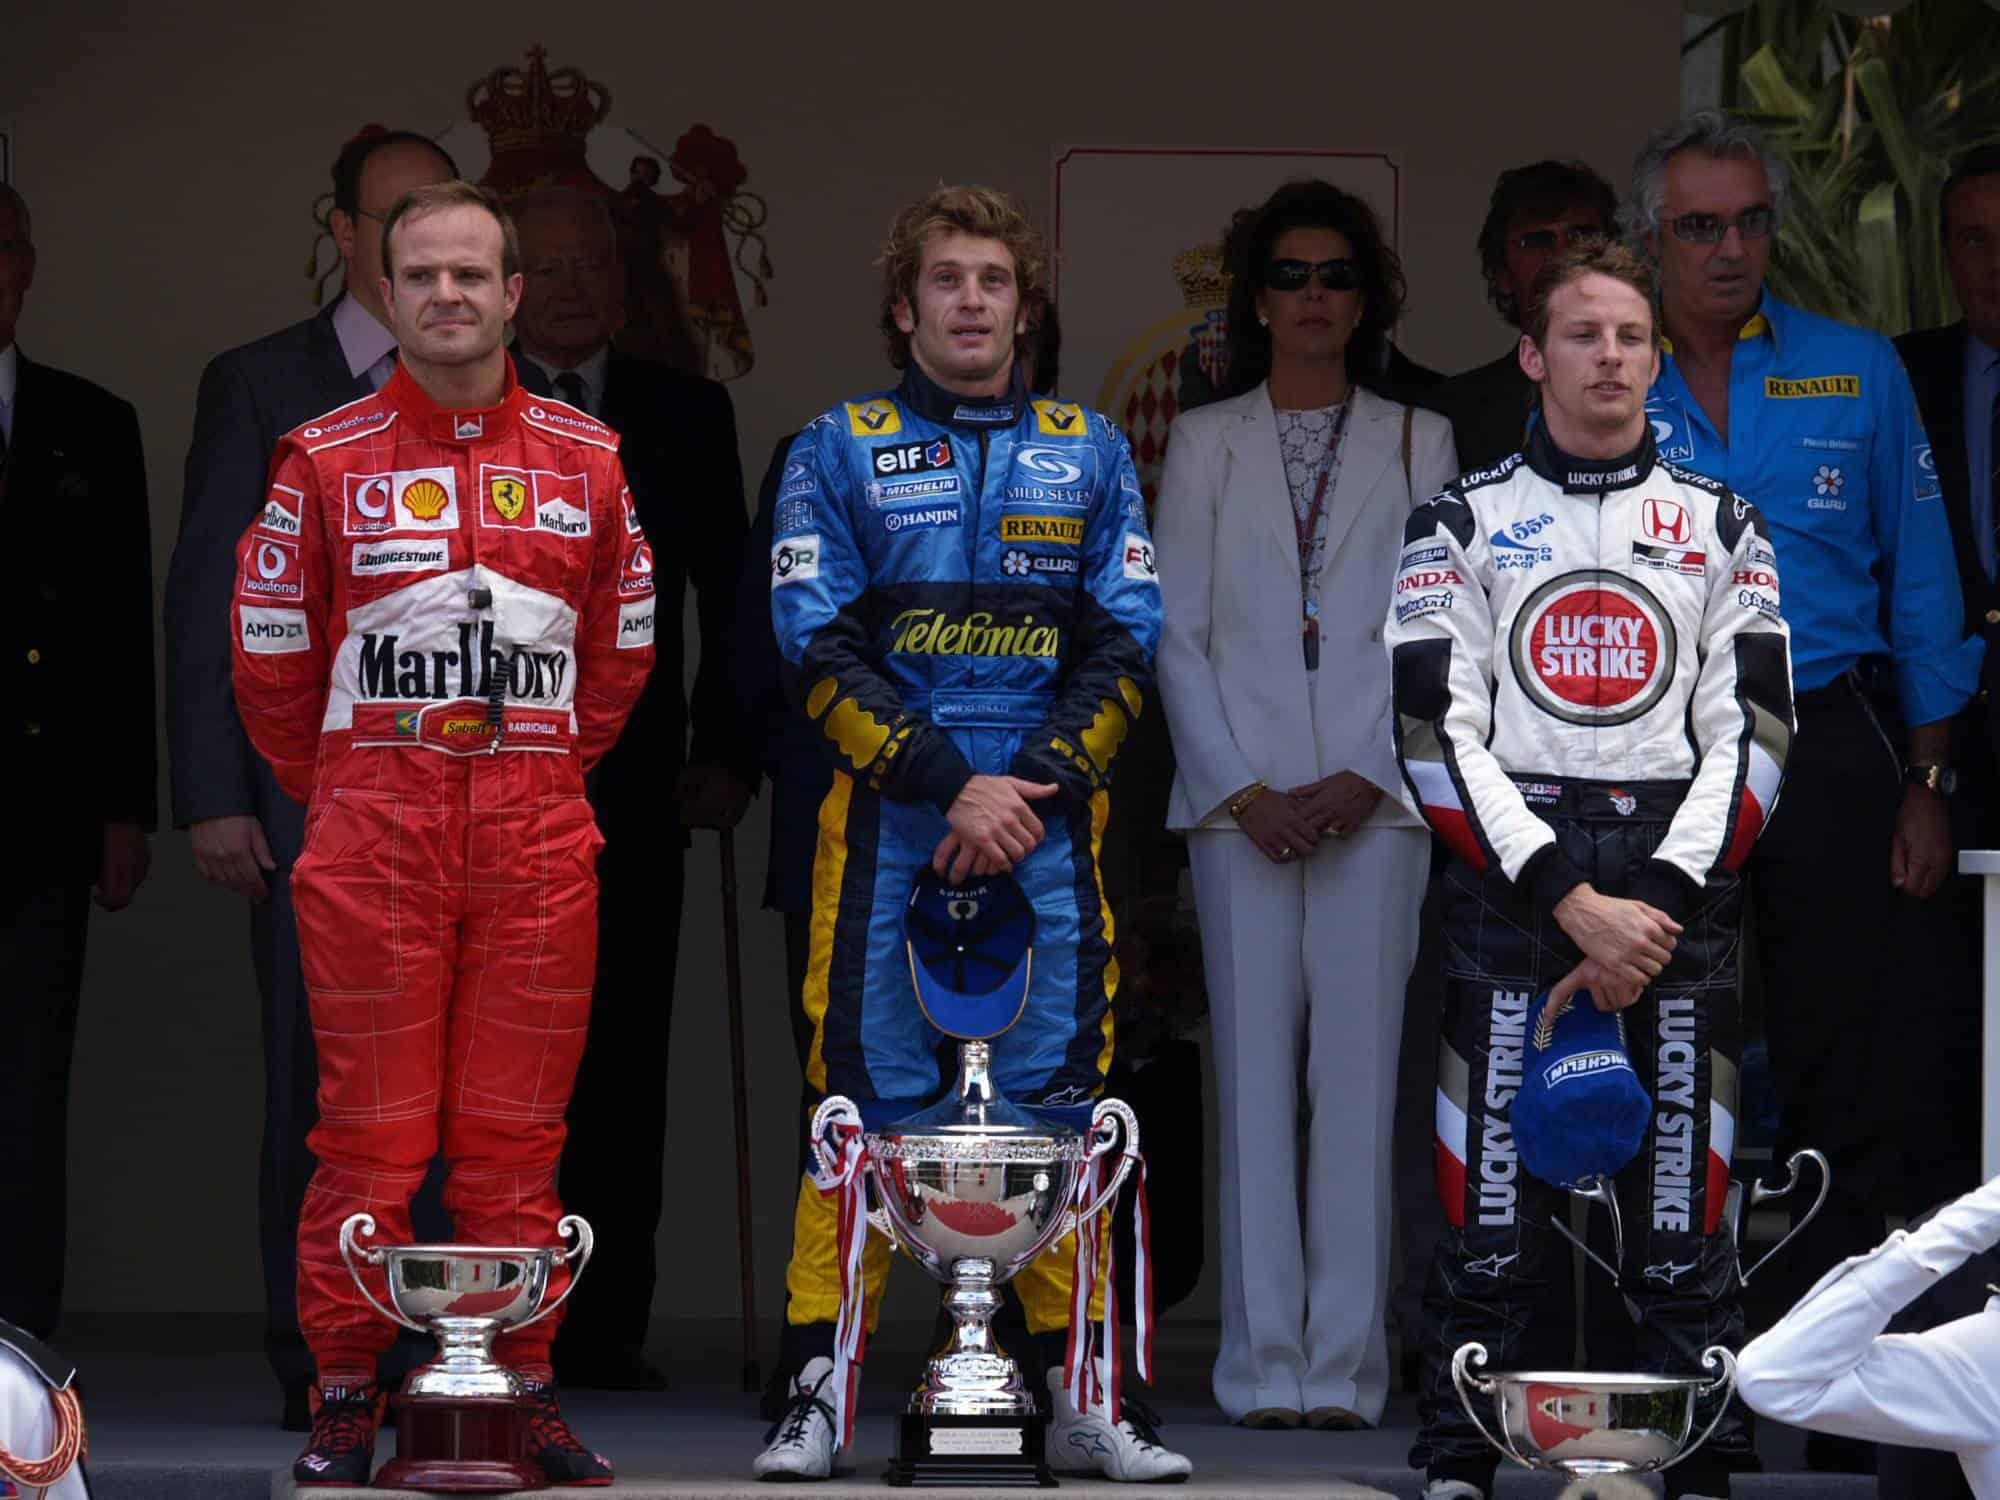 2004 Monaco GP – Trulli wins to stop Schumacher's winning streak